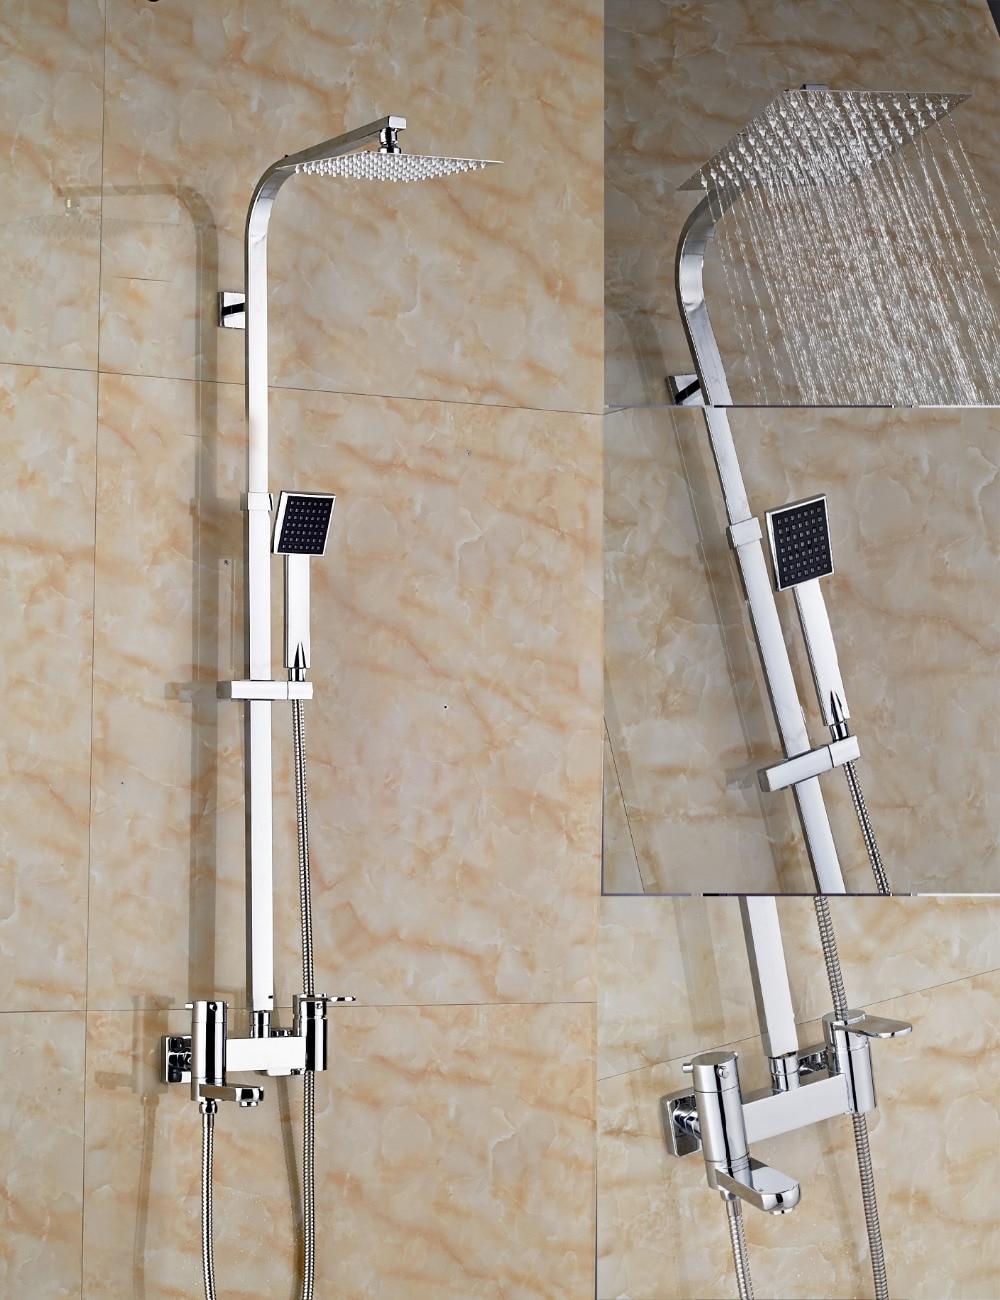 Wholesale And Retail Polished Chrome 8 Square Rain Shower Head Faucet Tub Spout Hand Shower Sprayer Shower Column